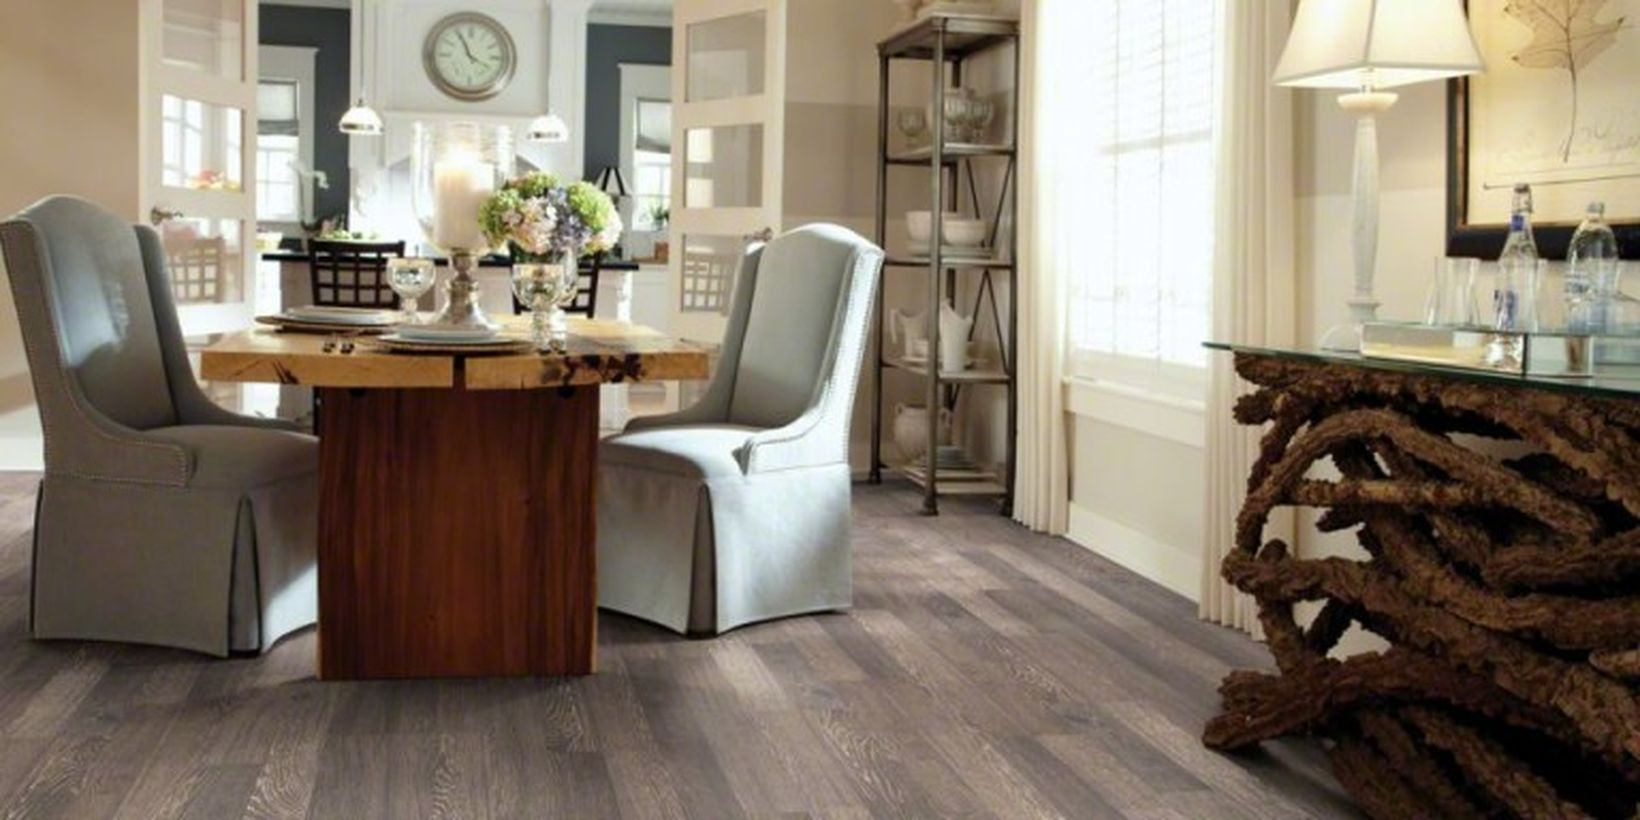 An impressive farmhouse flooring ideas for summer with this laminate floor makes it a good choice for a farmhouse floor to try